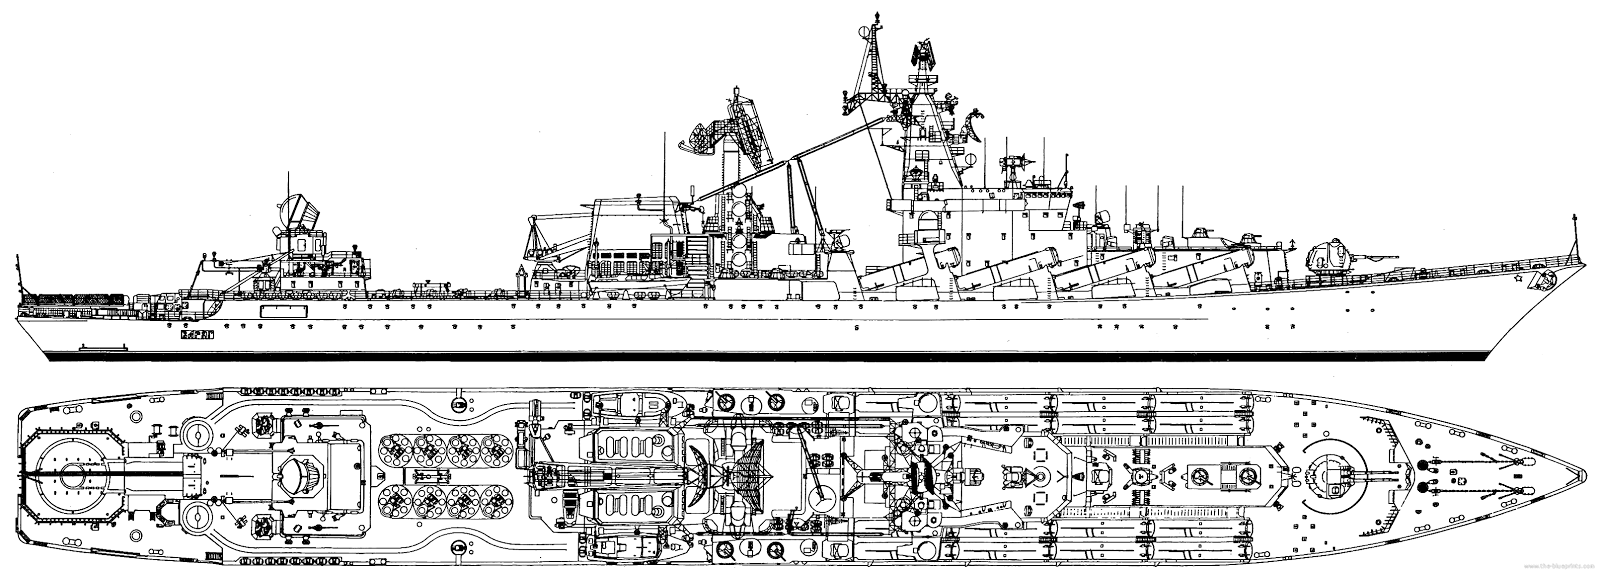 ussr-varyag-1989-slava-class-project-1164-missile-cruiser